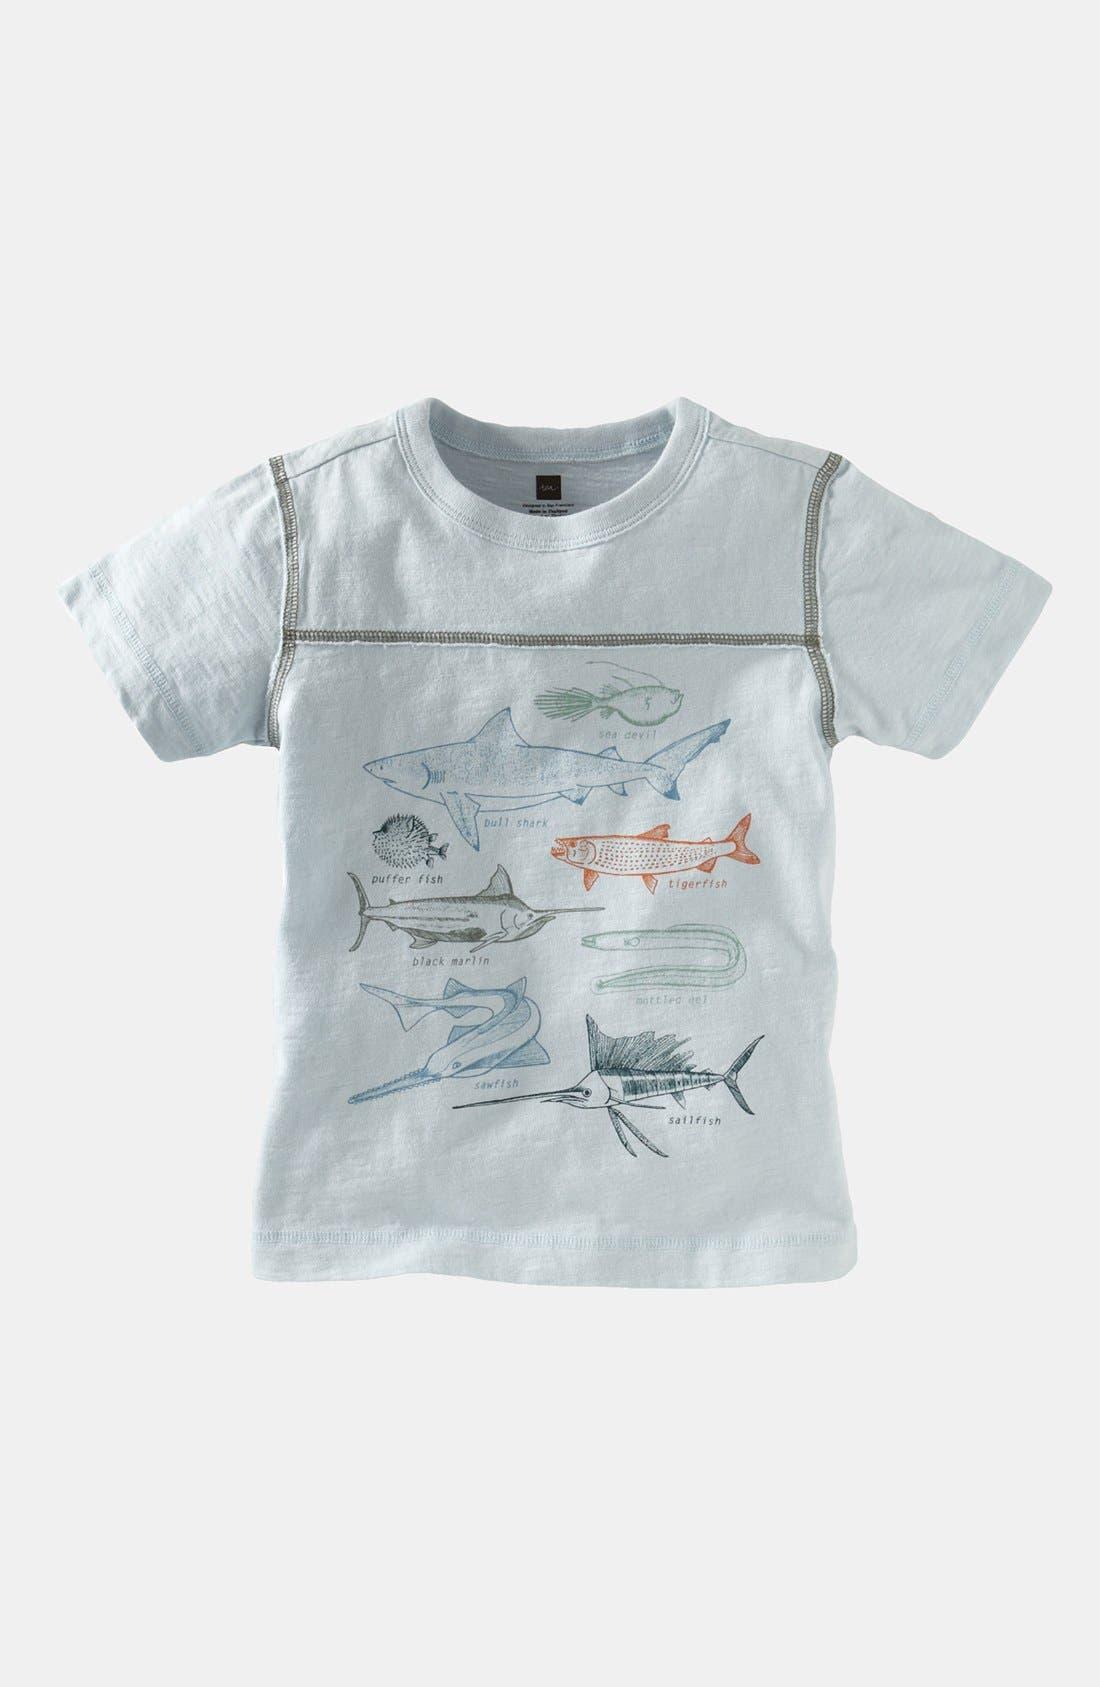 Alternate Image 1 Selected - Tea Collection 'Fish I.D.' T-Shirt (Toddler)